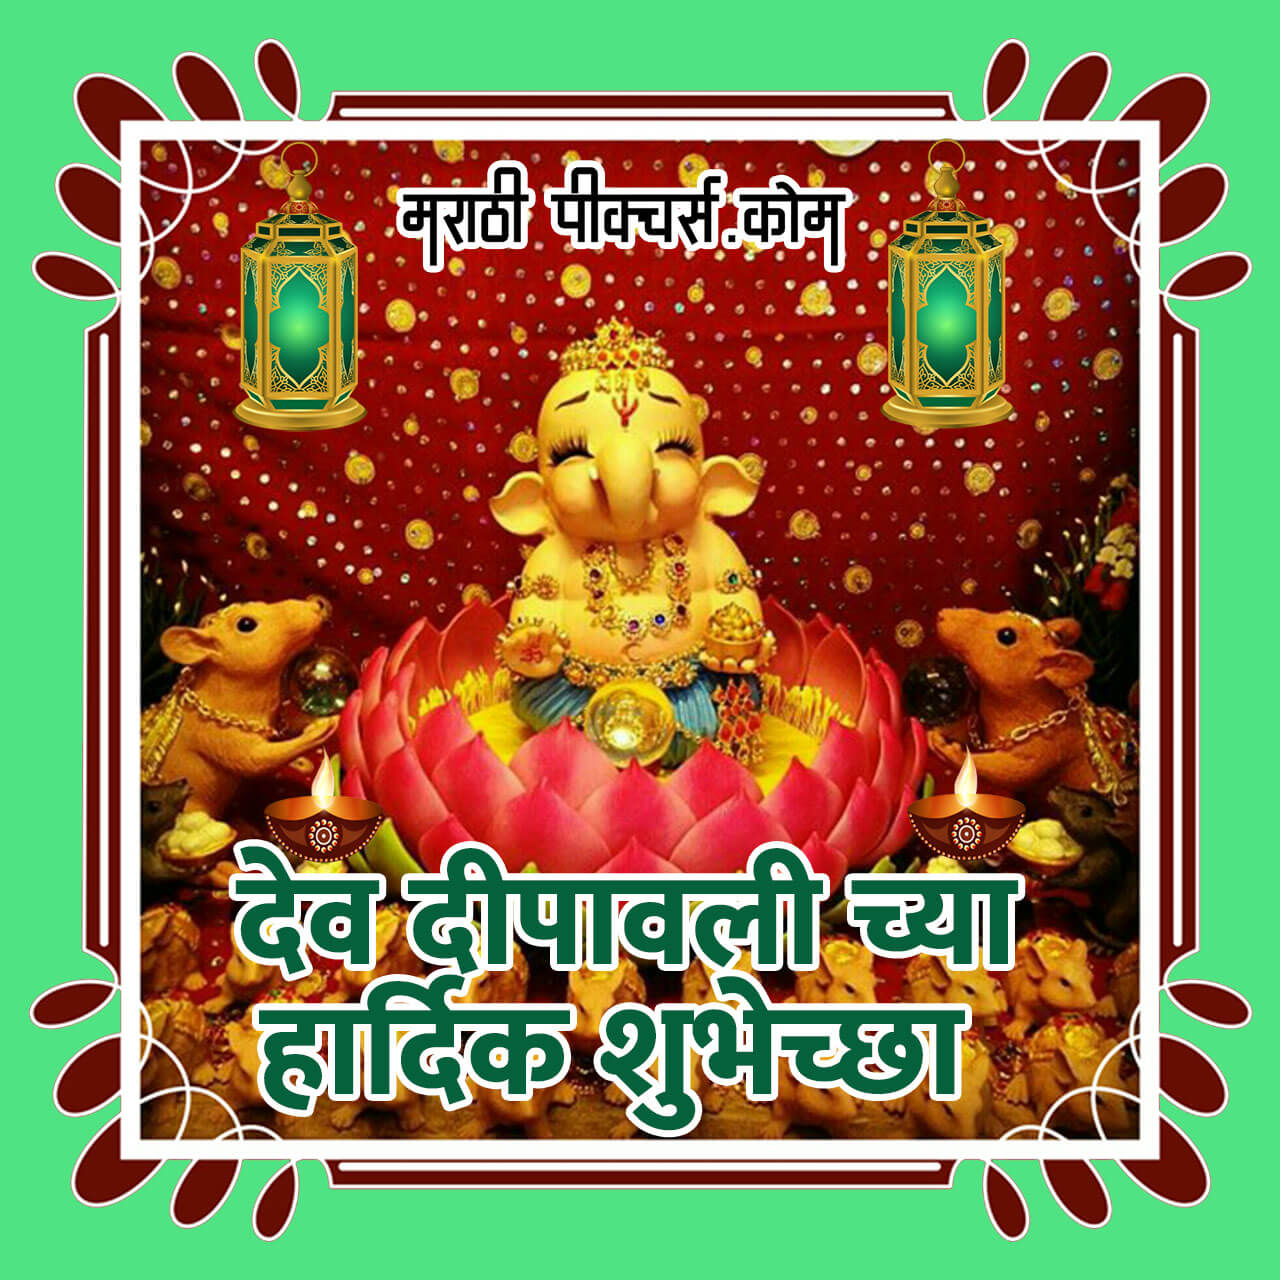 Dev Deepavali Chya Hardik Shubhechha - Marathi Pictures ... Vadhdivas Chya Hardik Shubhechha